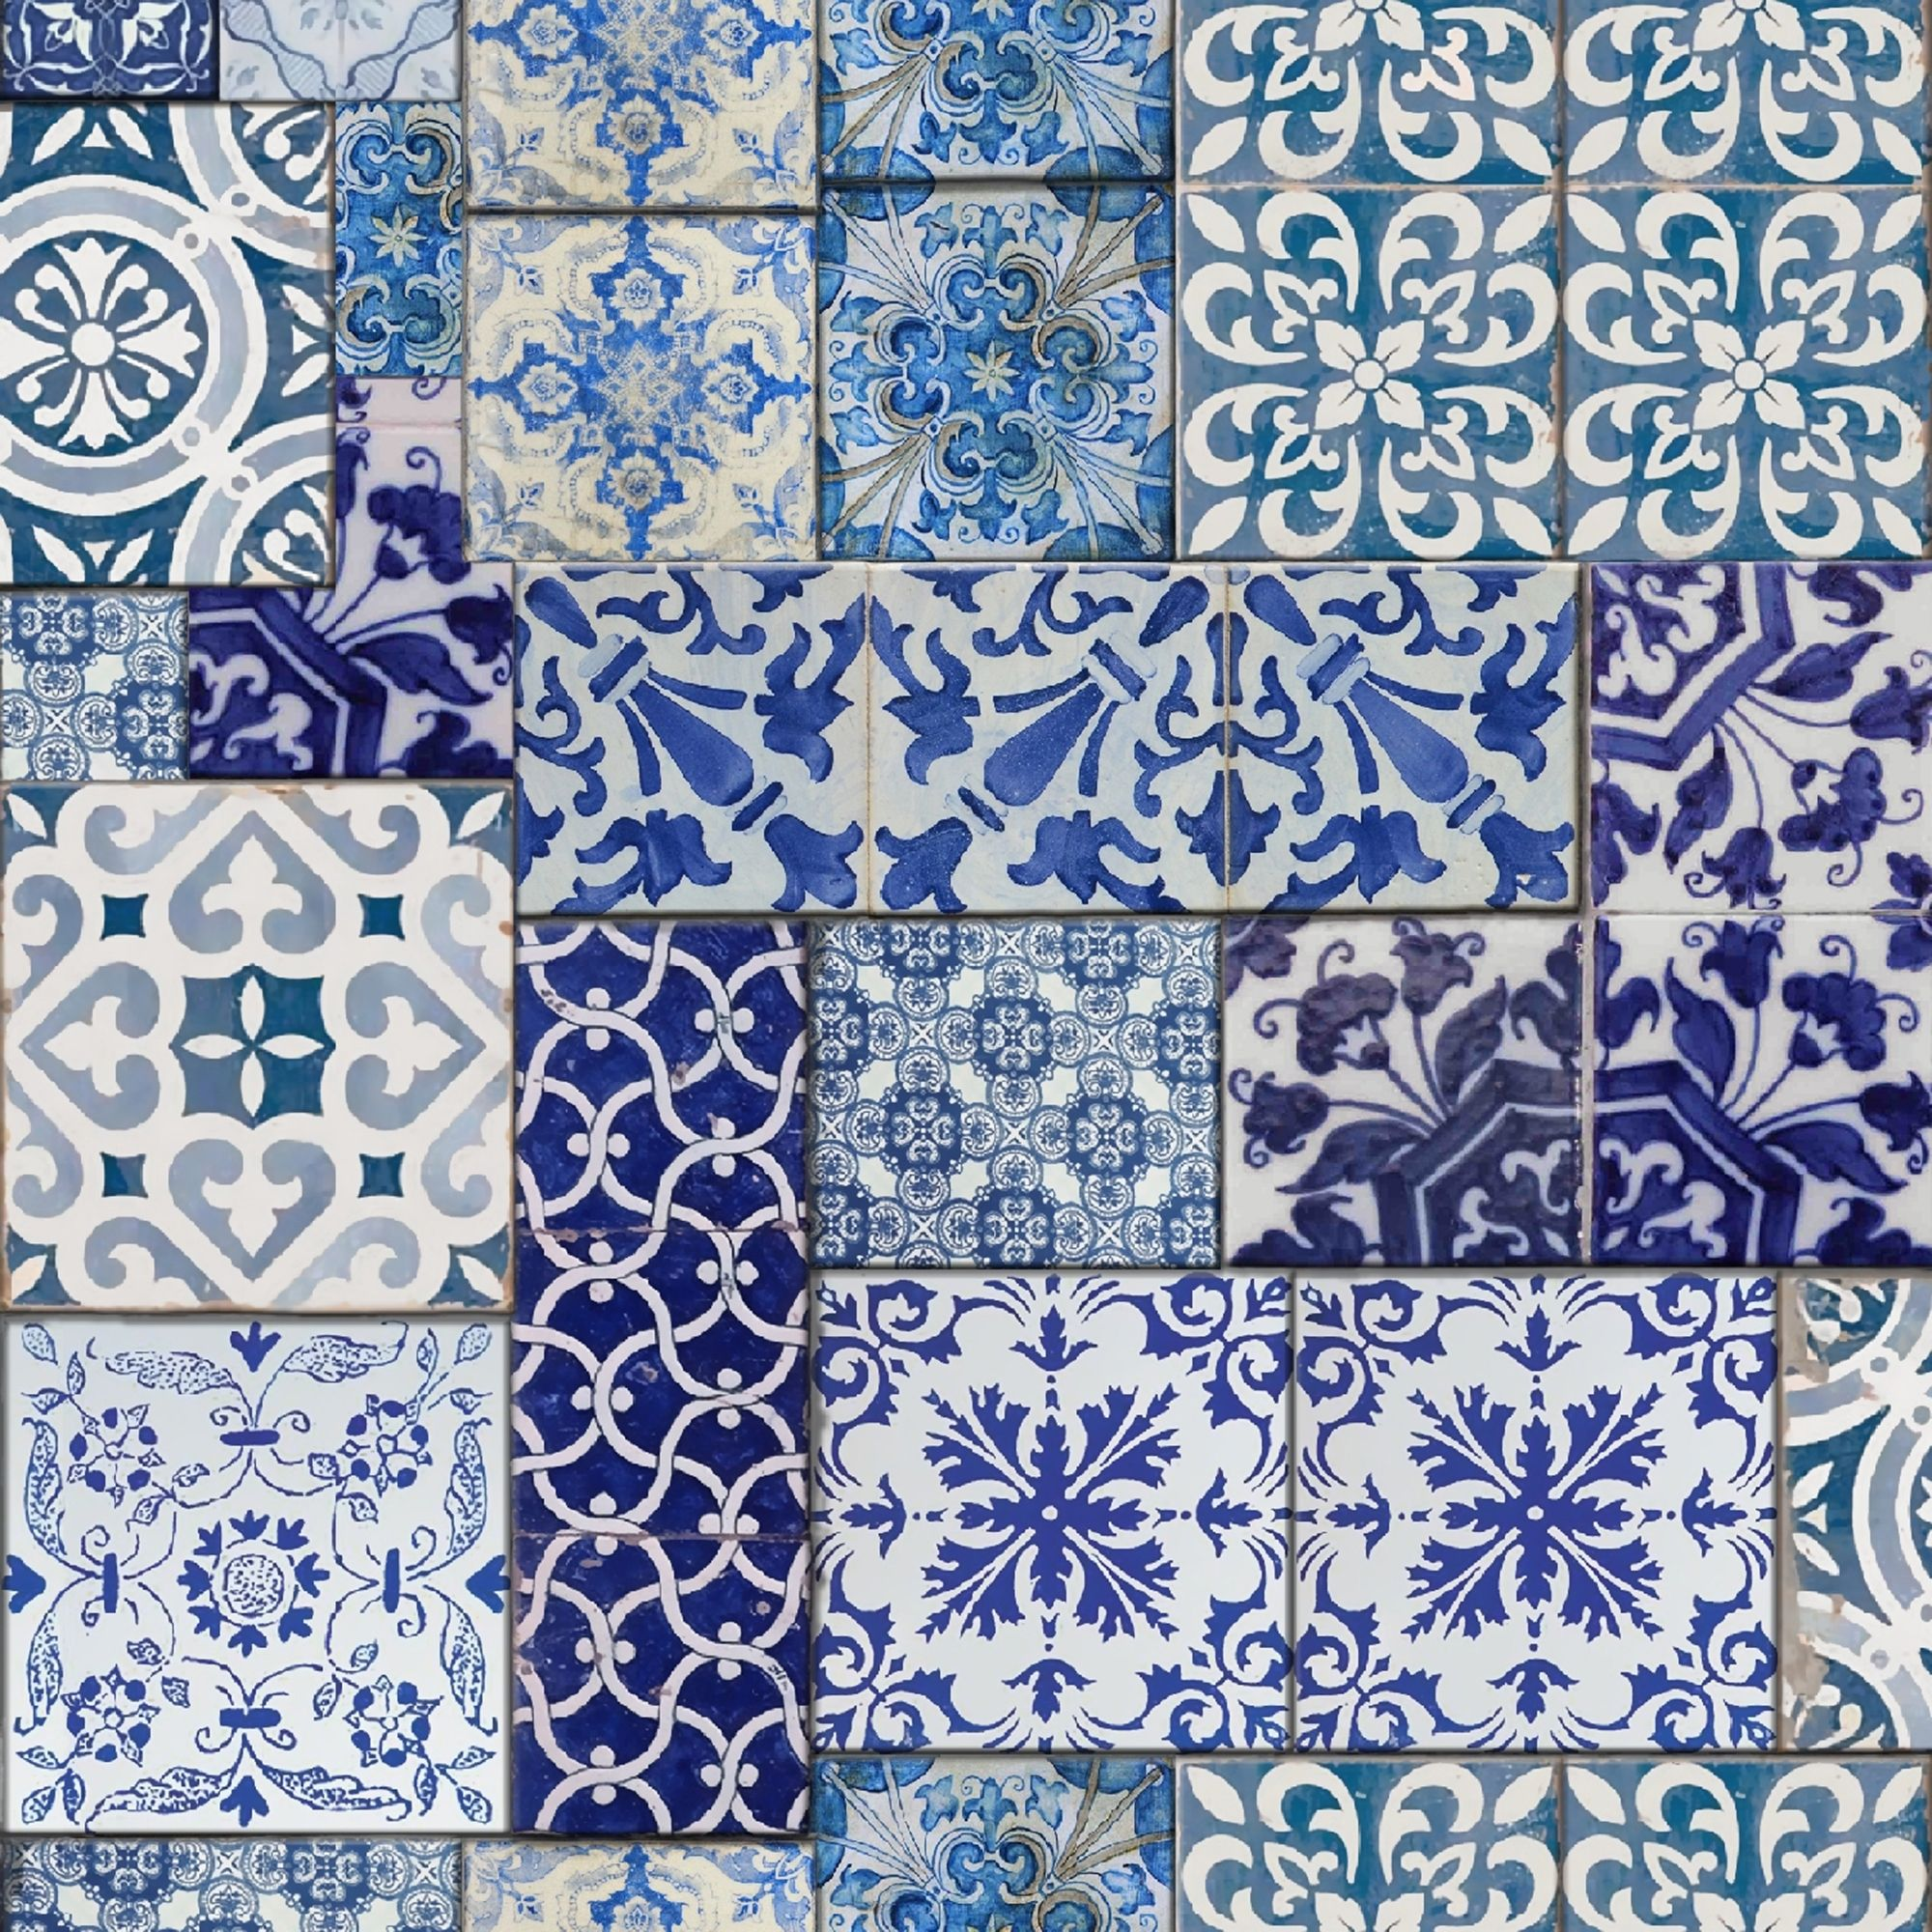 Muriva moroccan tiles wallpaper blue white 601547 for Moroccan style wallpaper